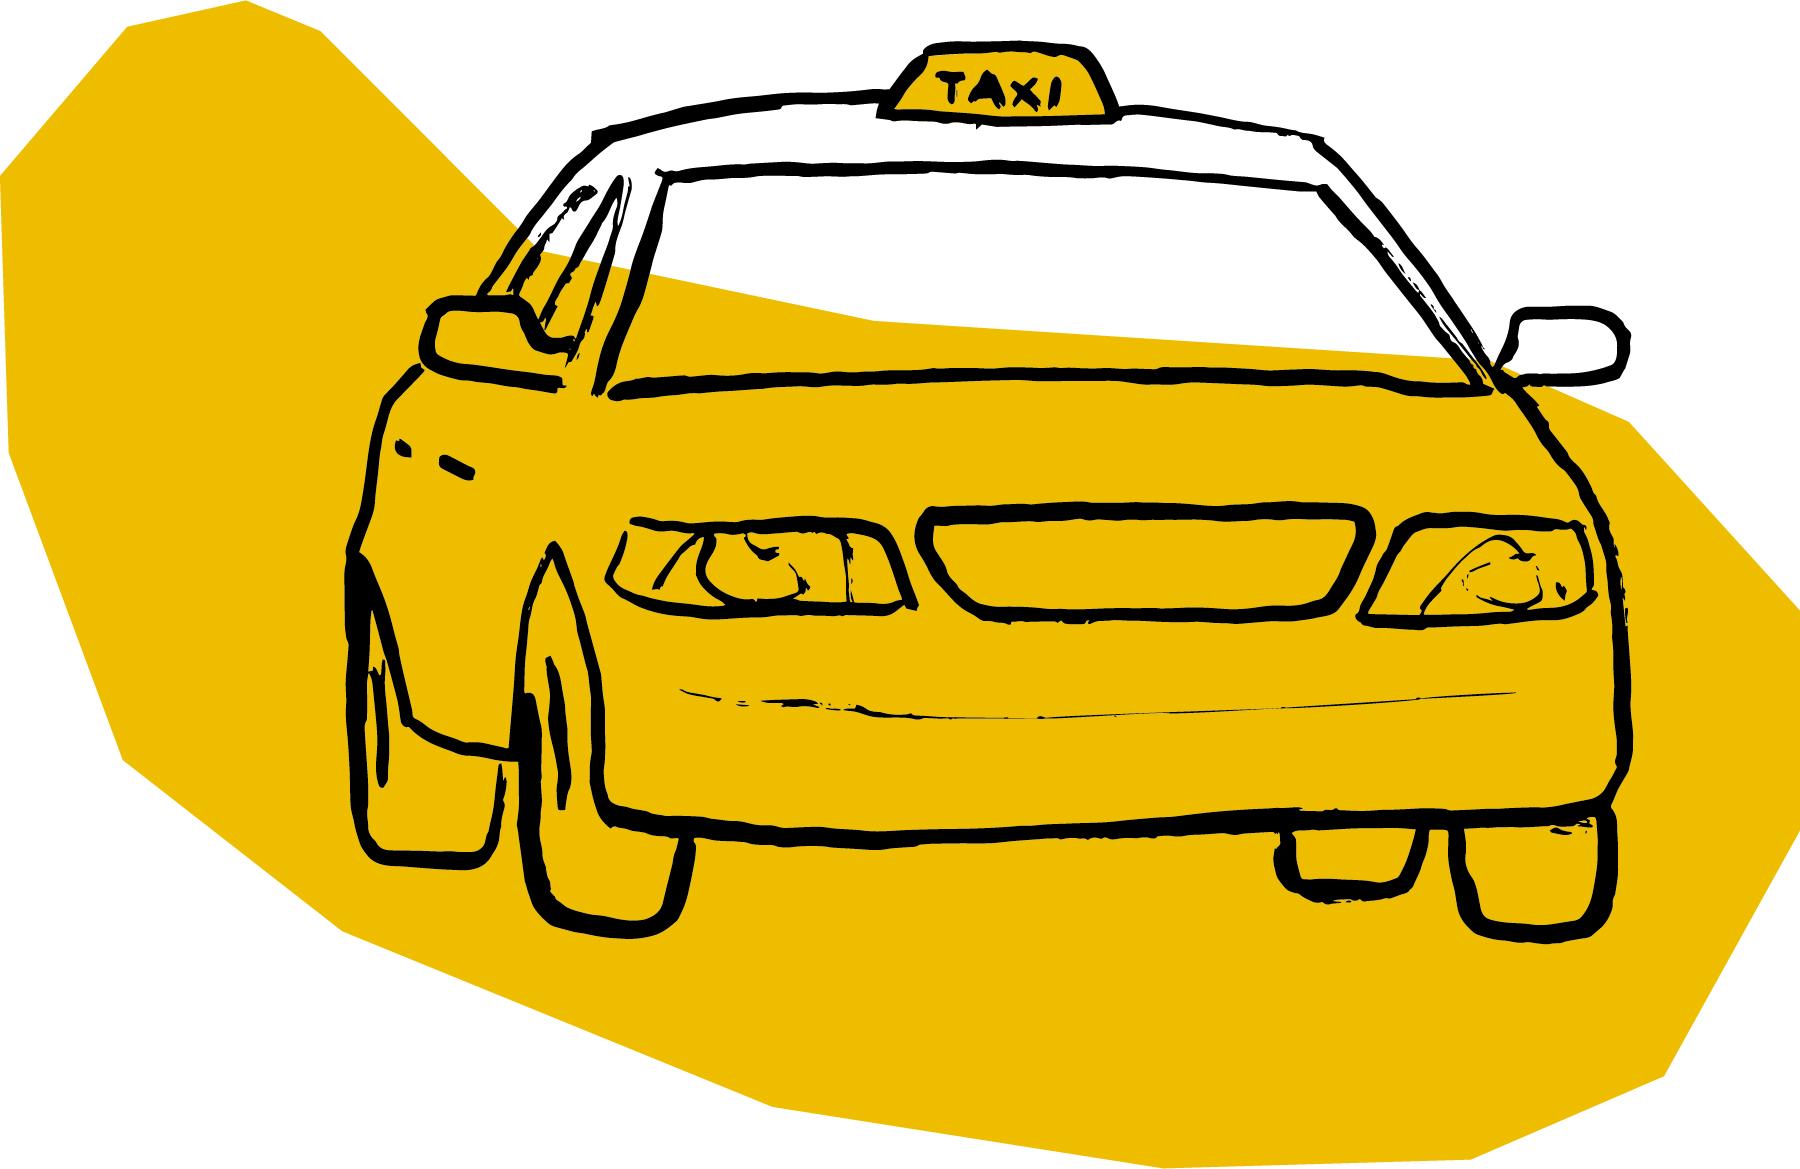 TaxiDEF.jpg